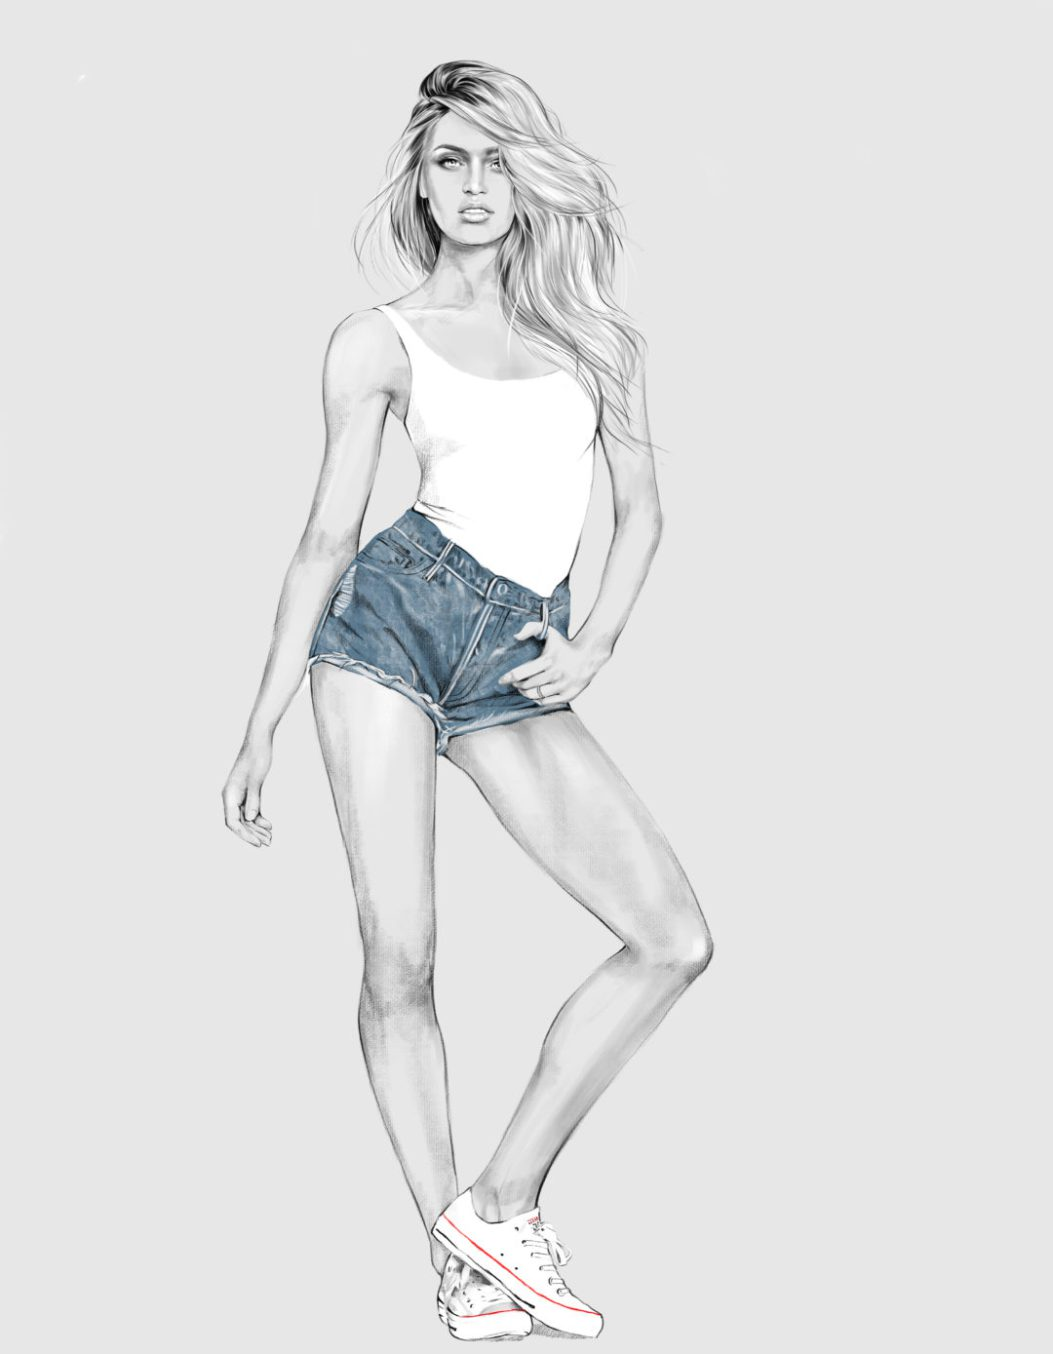 2D Female Casual Denim Short Fashion Illustration